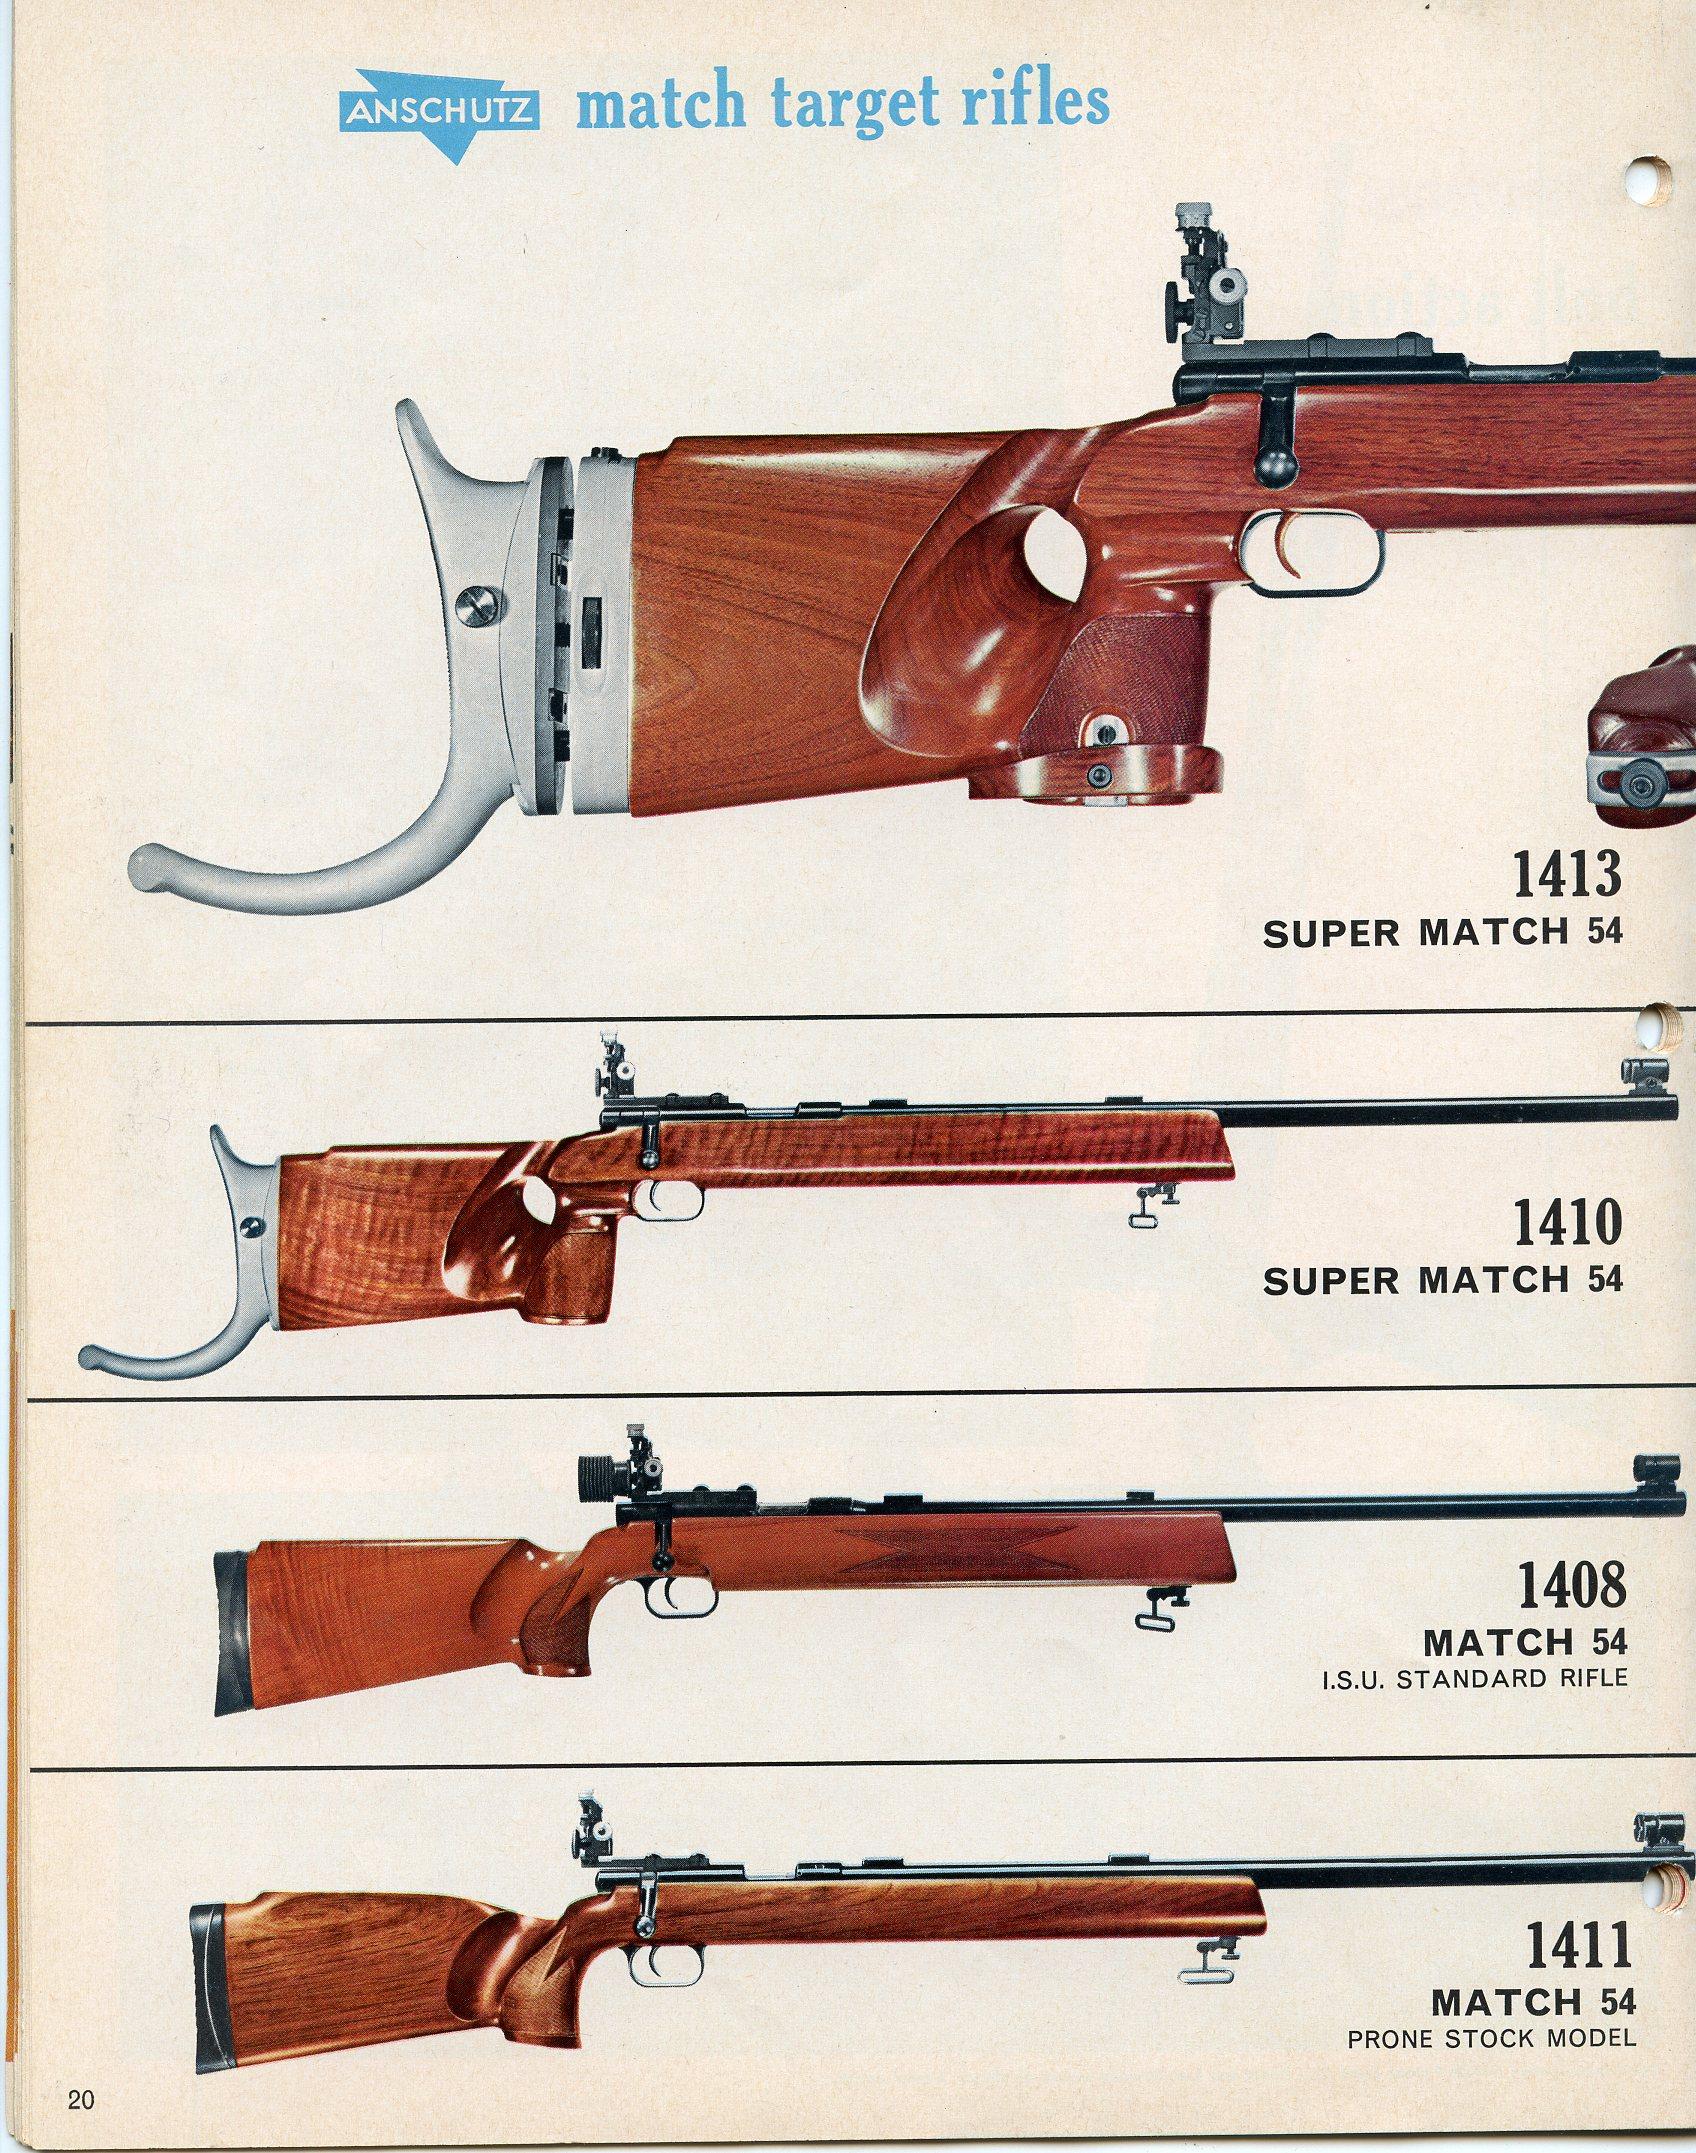 Anschütz family- Suhl & Zella Mehlis – German Hunting Guns